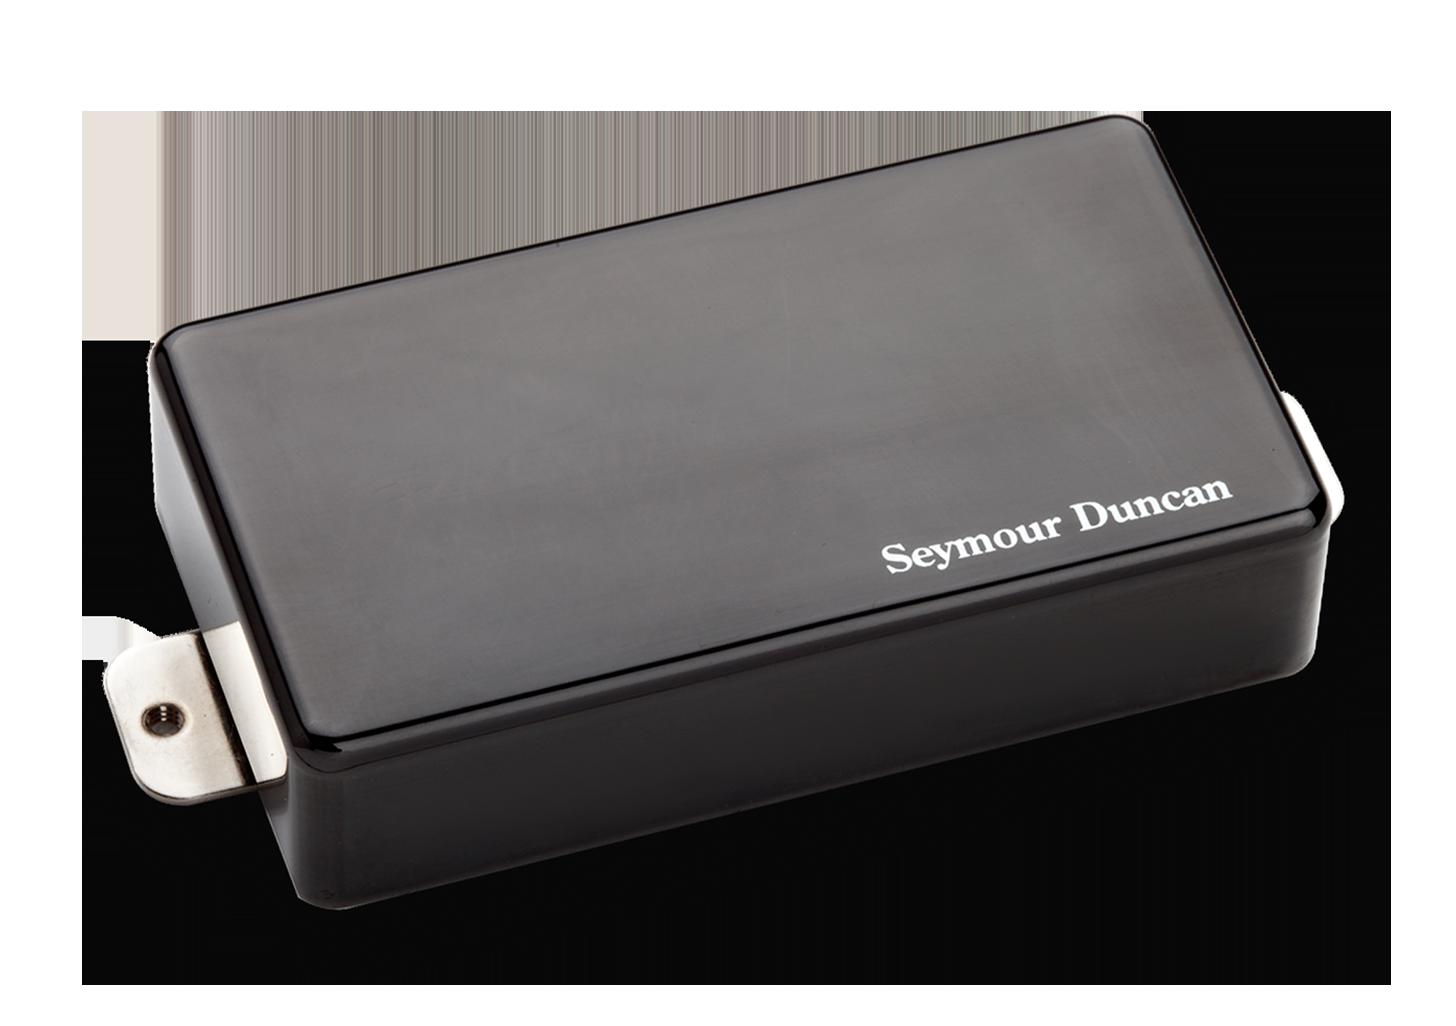 Seymour Duncan Blackouts AHB-1B Bridge Black Chrome